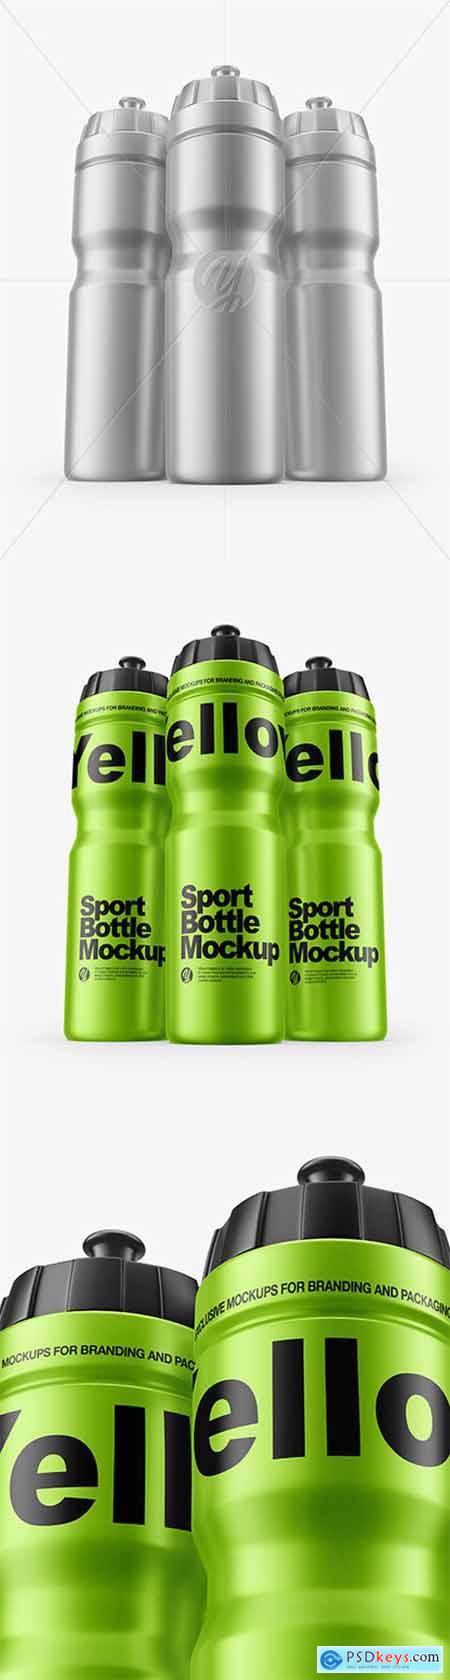 Three Matte Metallic Sport Bottles Mockup 60137